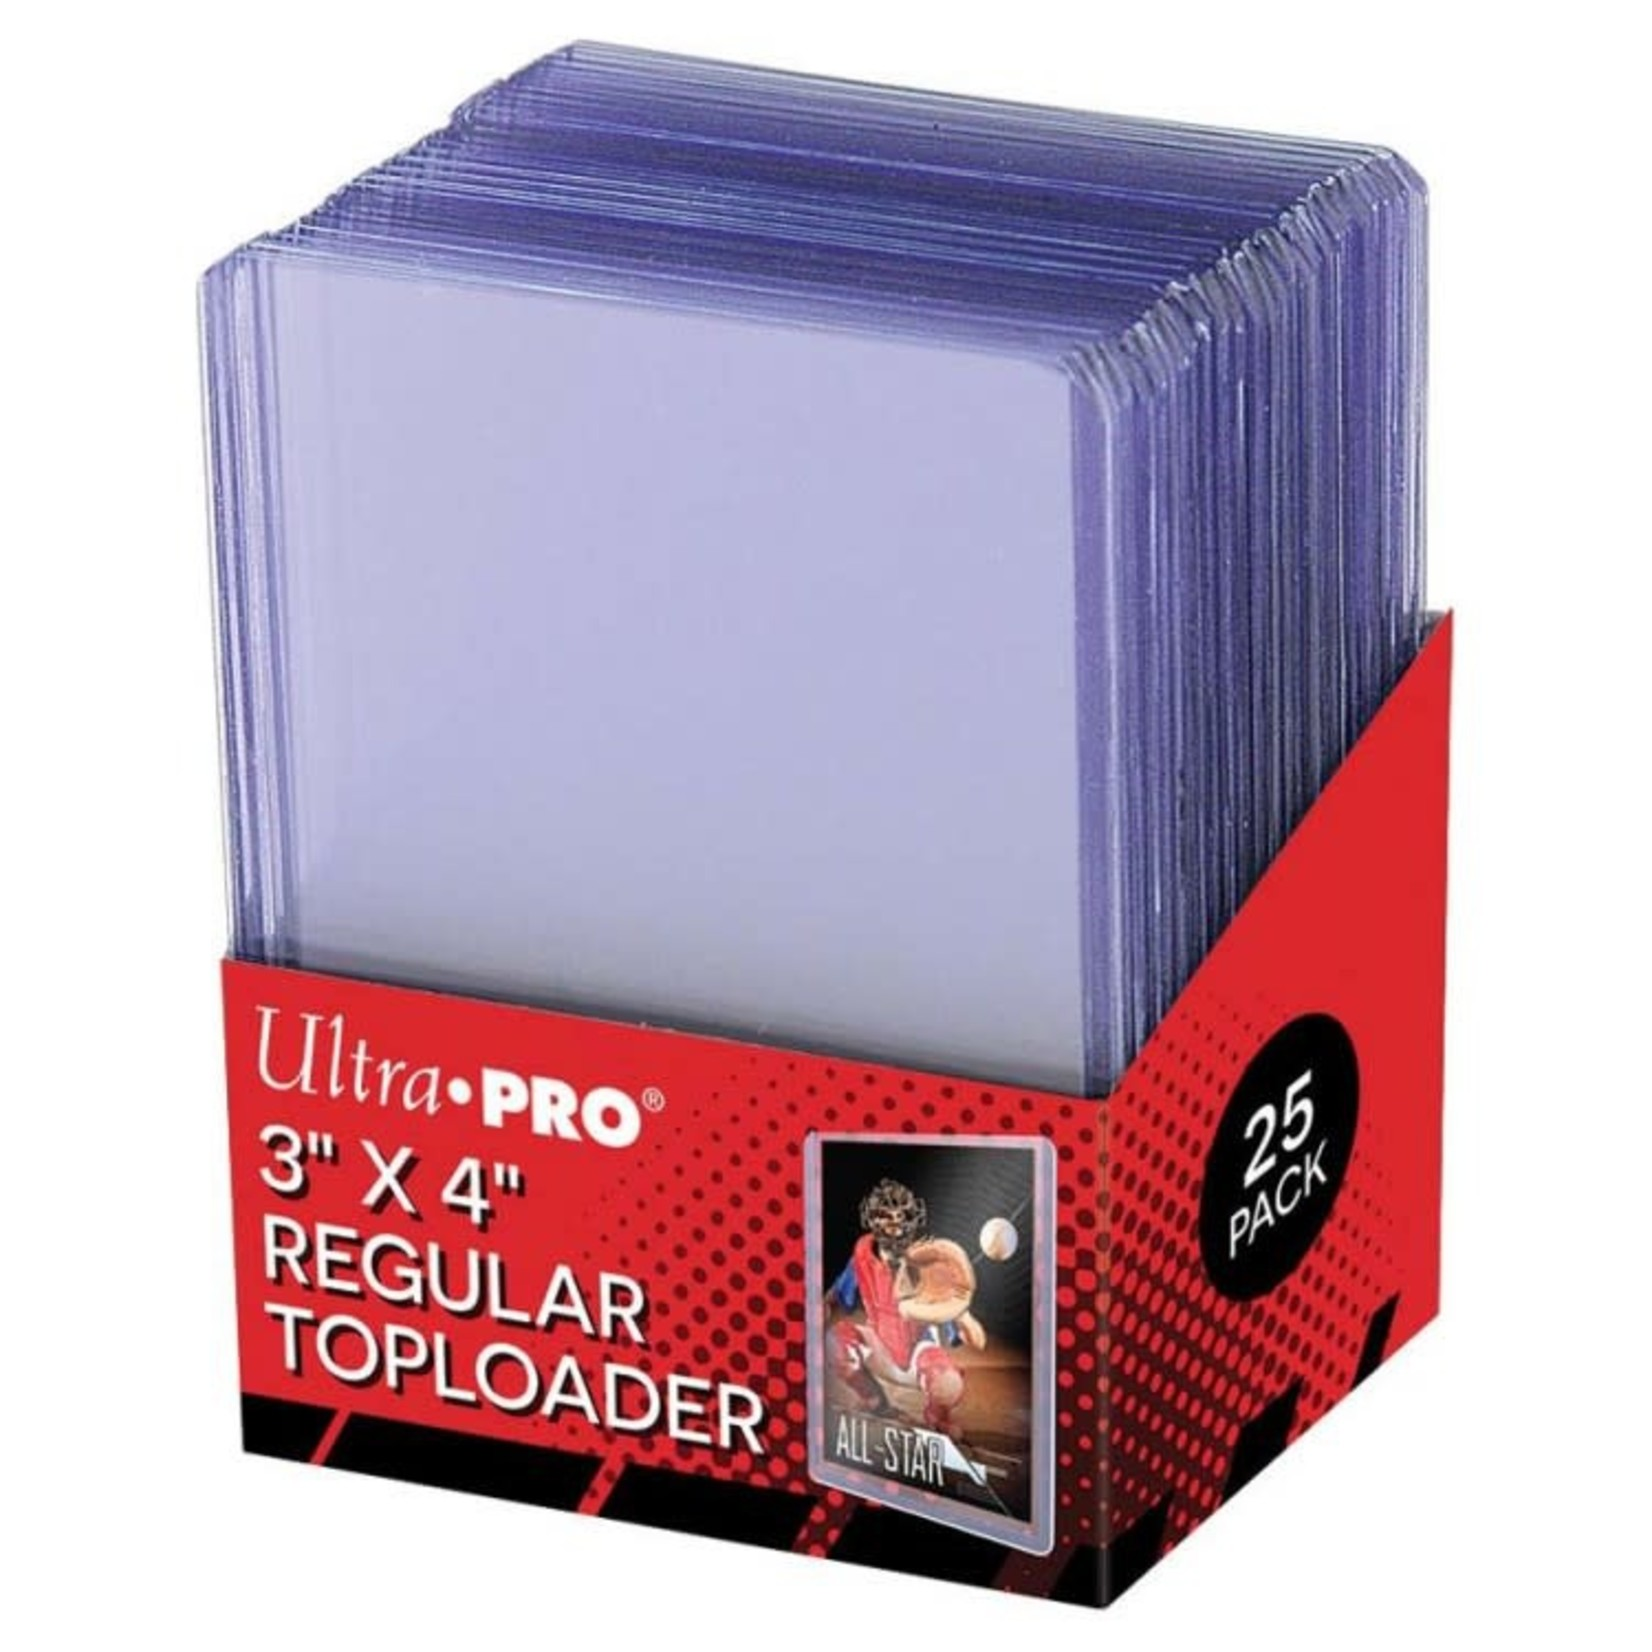 "Ultra Pro Card Protector: TopLoader 3"" x 4"" Regular, 25 ct"